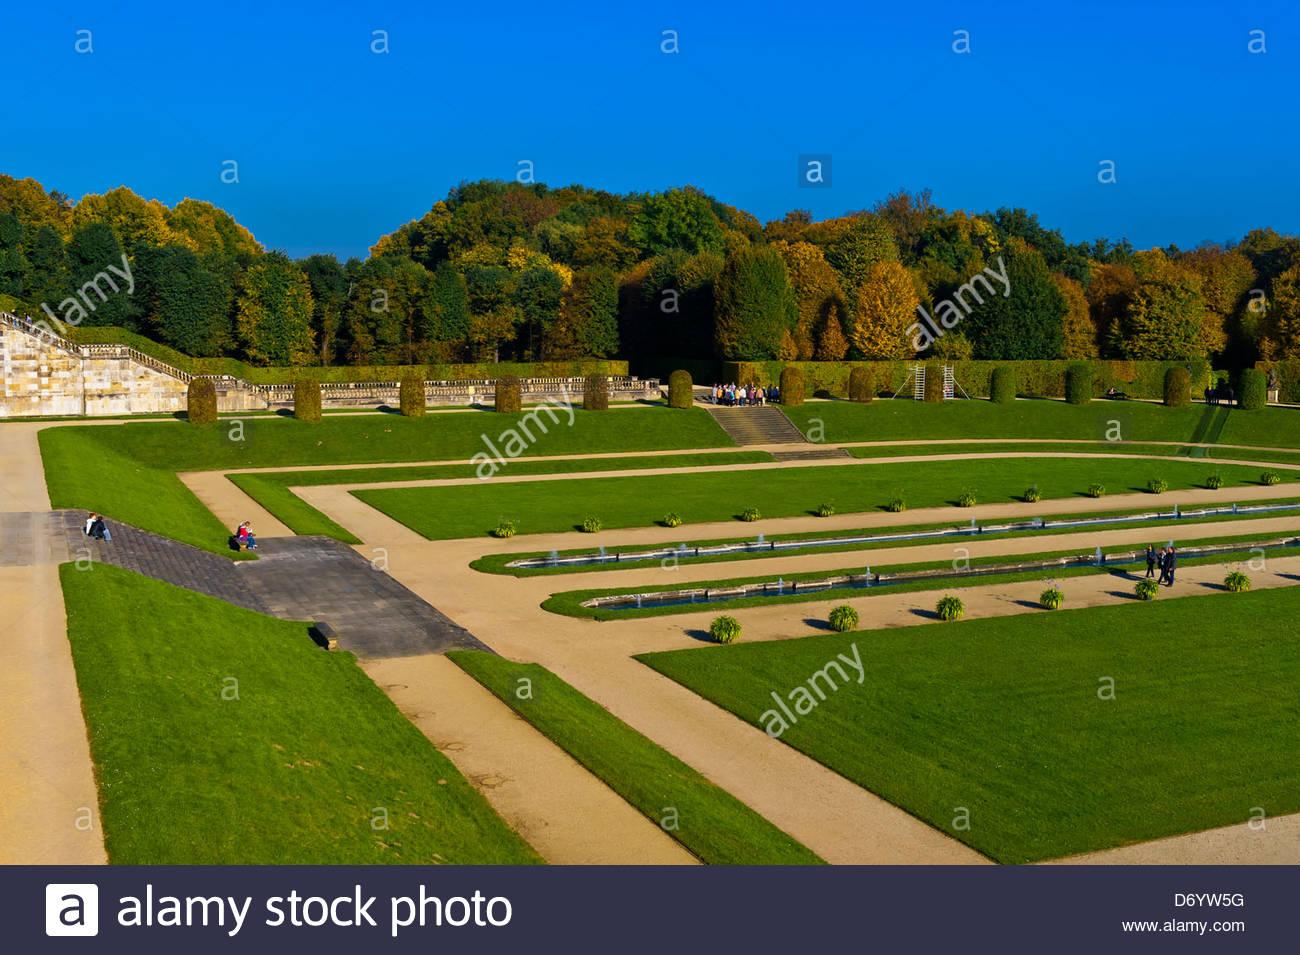 Grossedlitz Baroque Garden, Pillnitz, Saxony, Germany - Stock Image